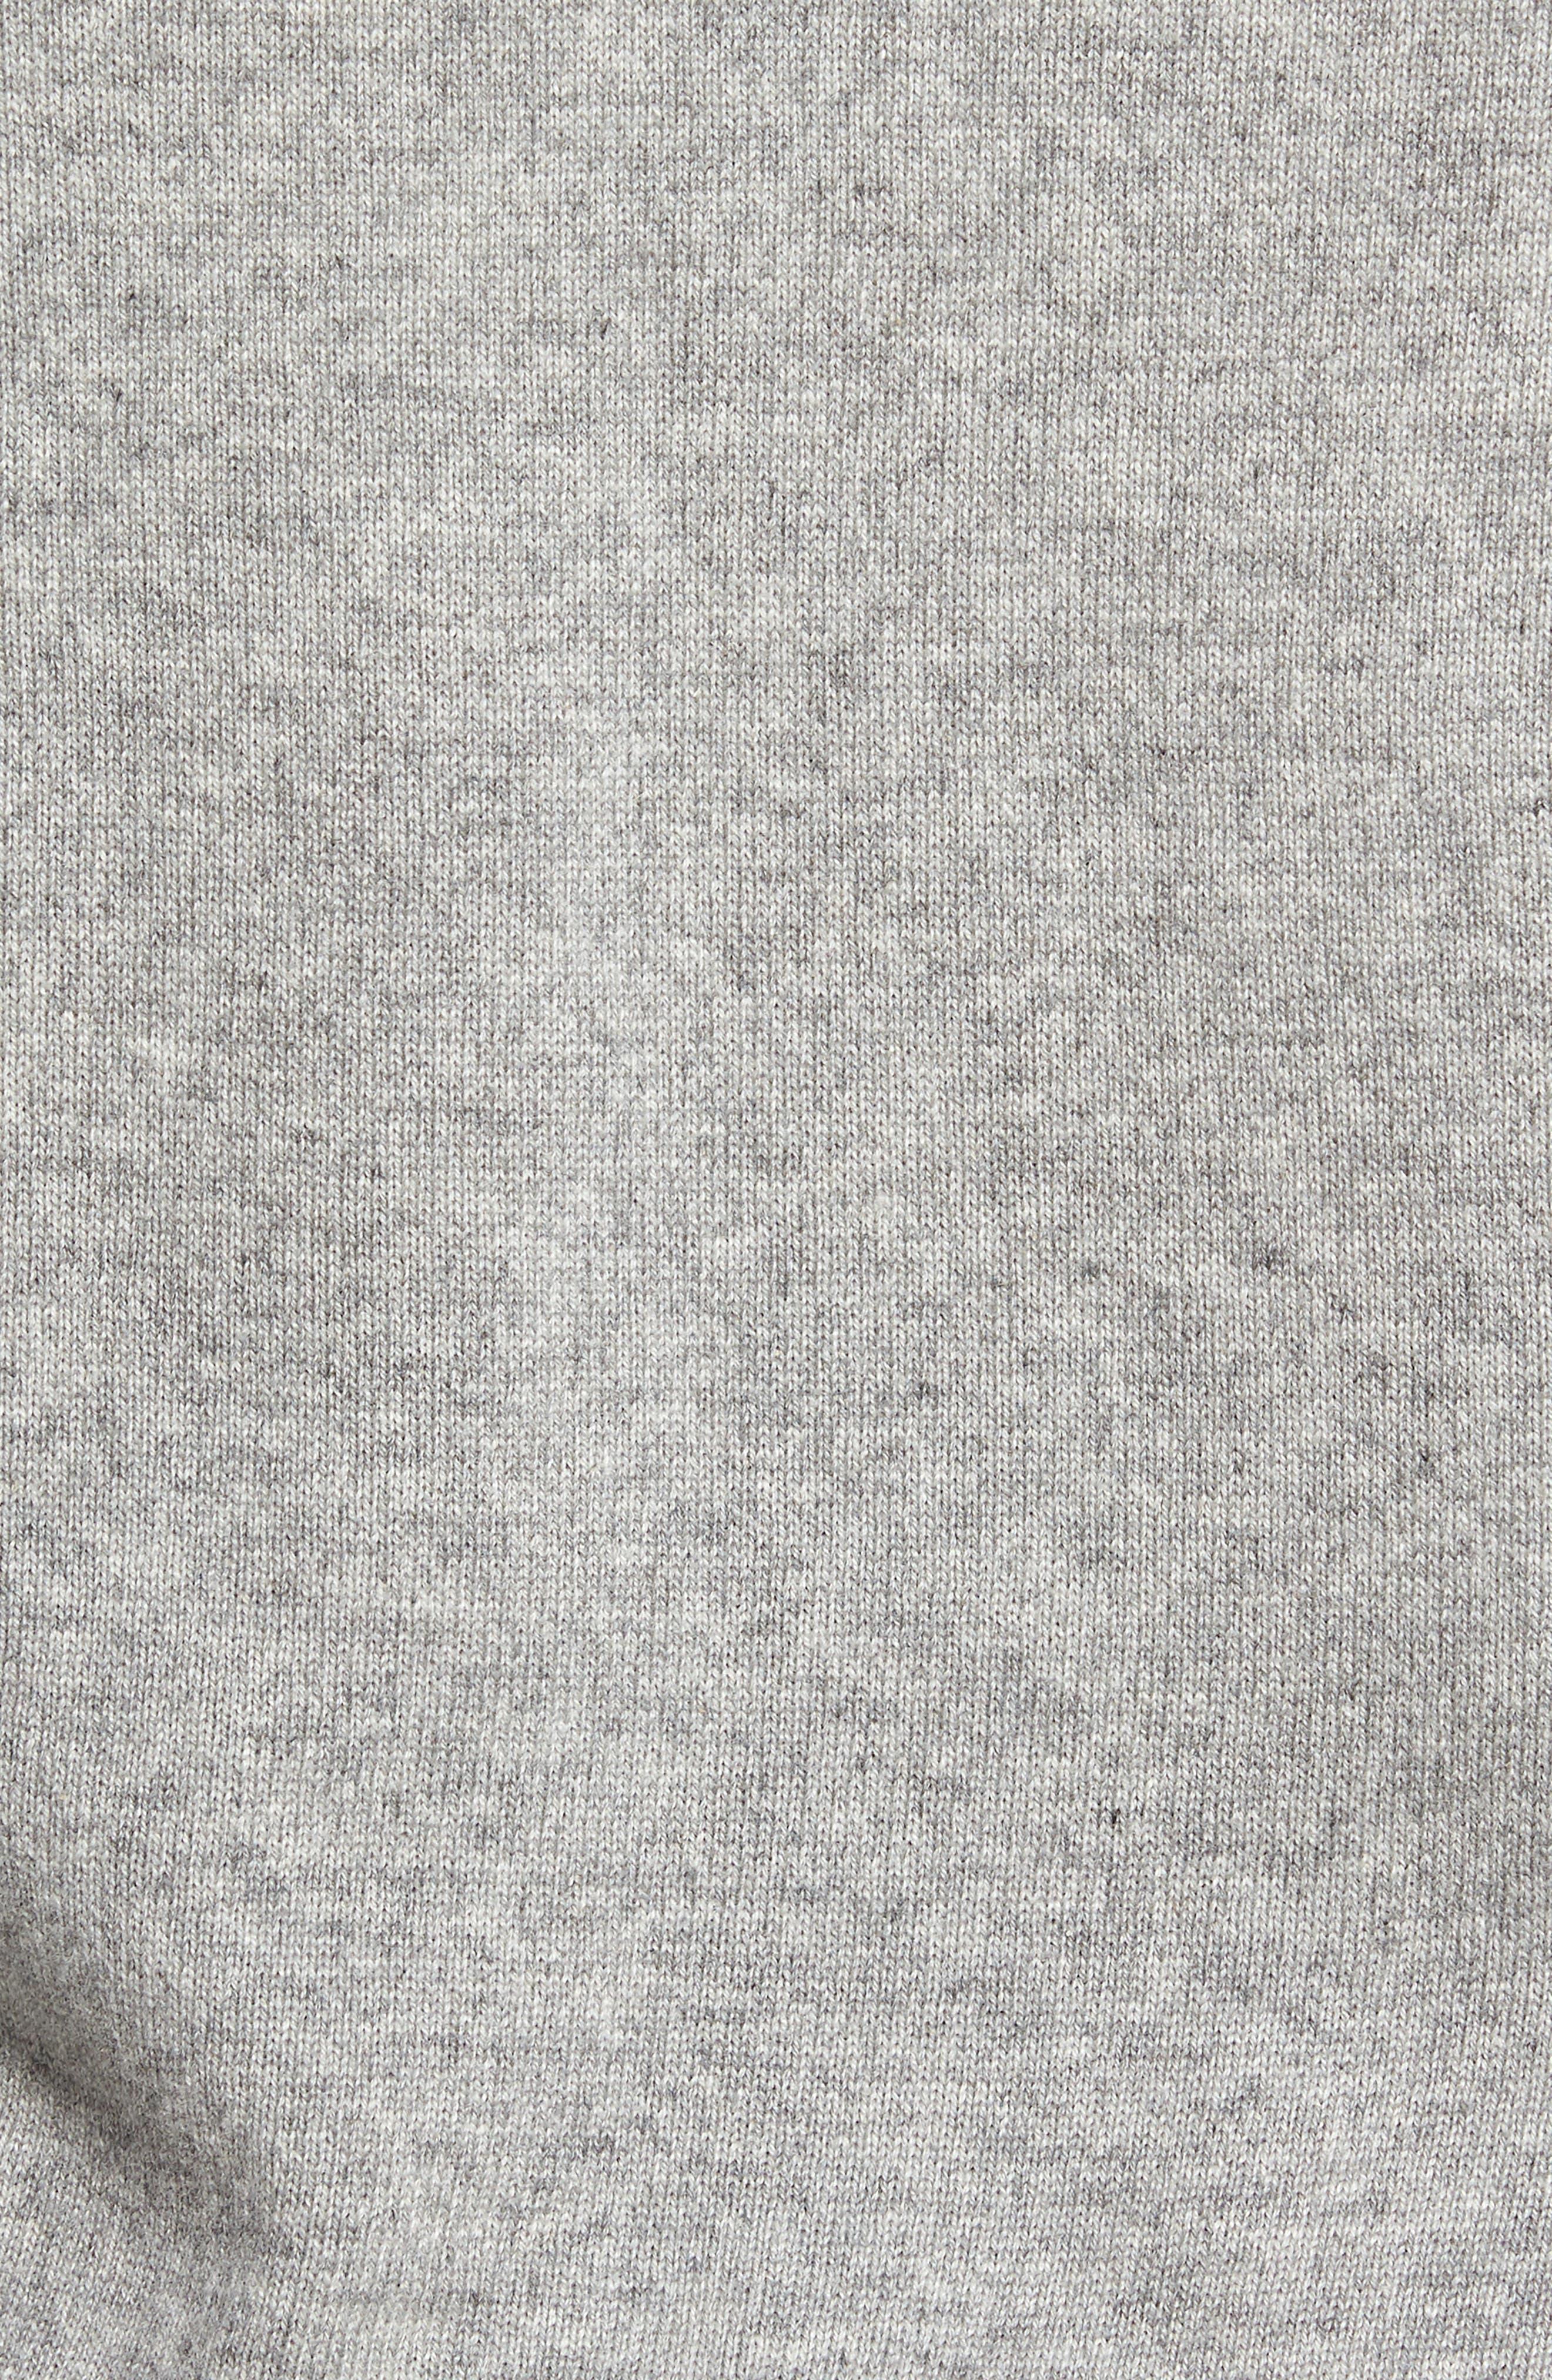 Alternate Image 6  - Everlane The Cashmere Hoodie